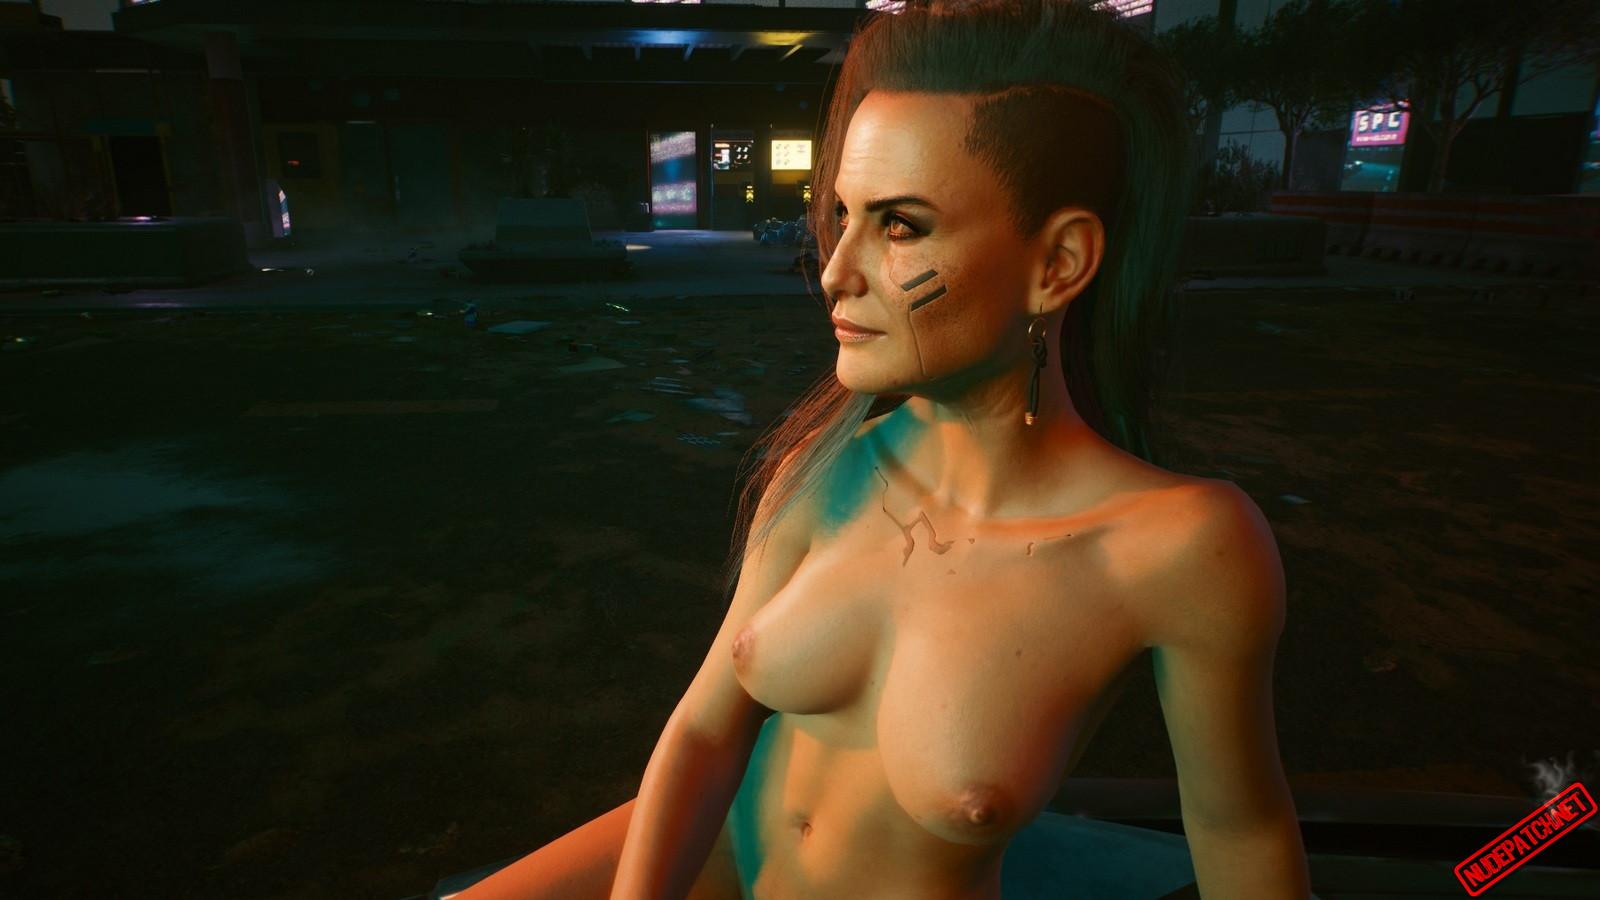 Cyberpunk 2077 Barefoot and Naked Rogue